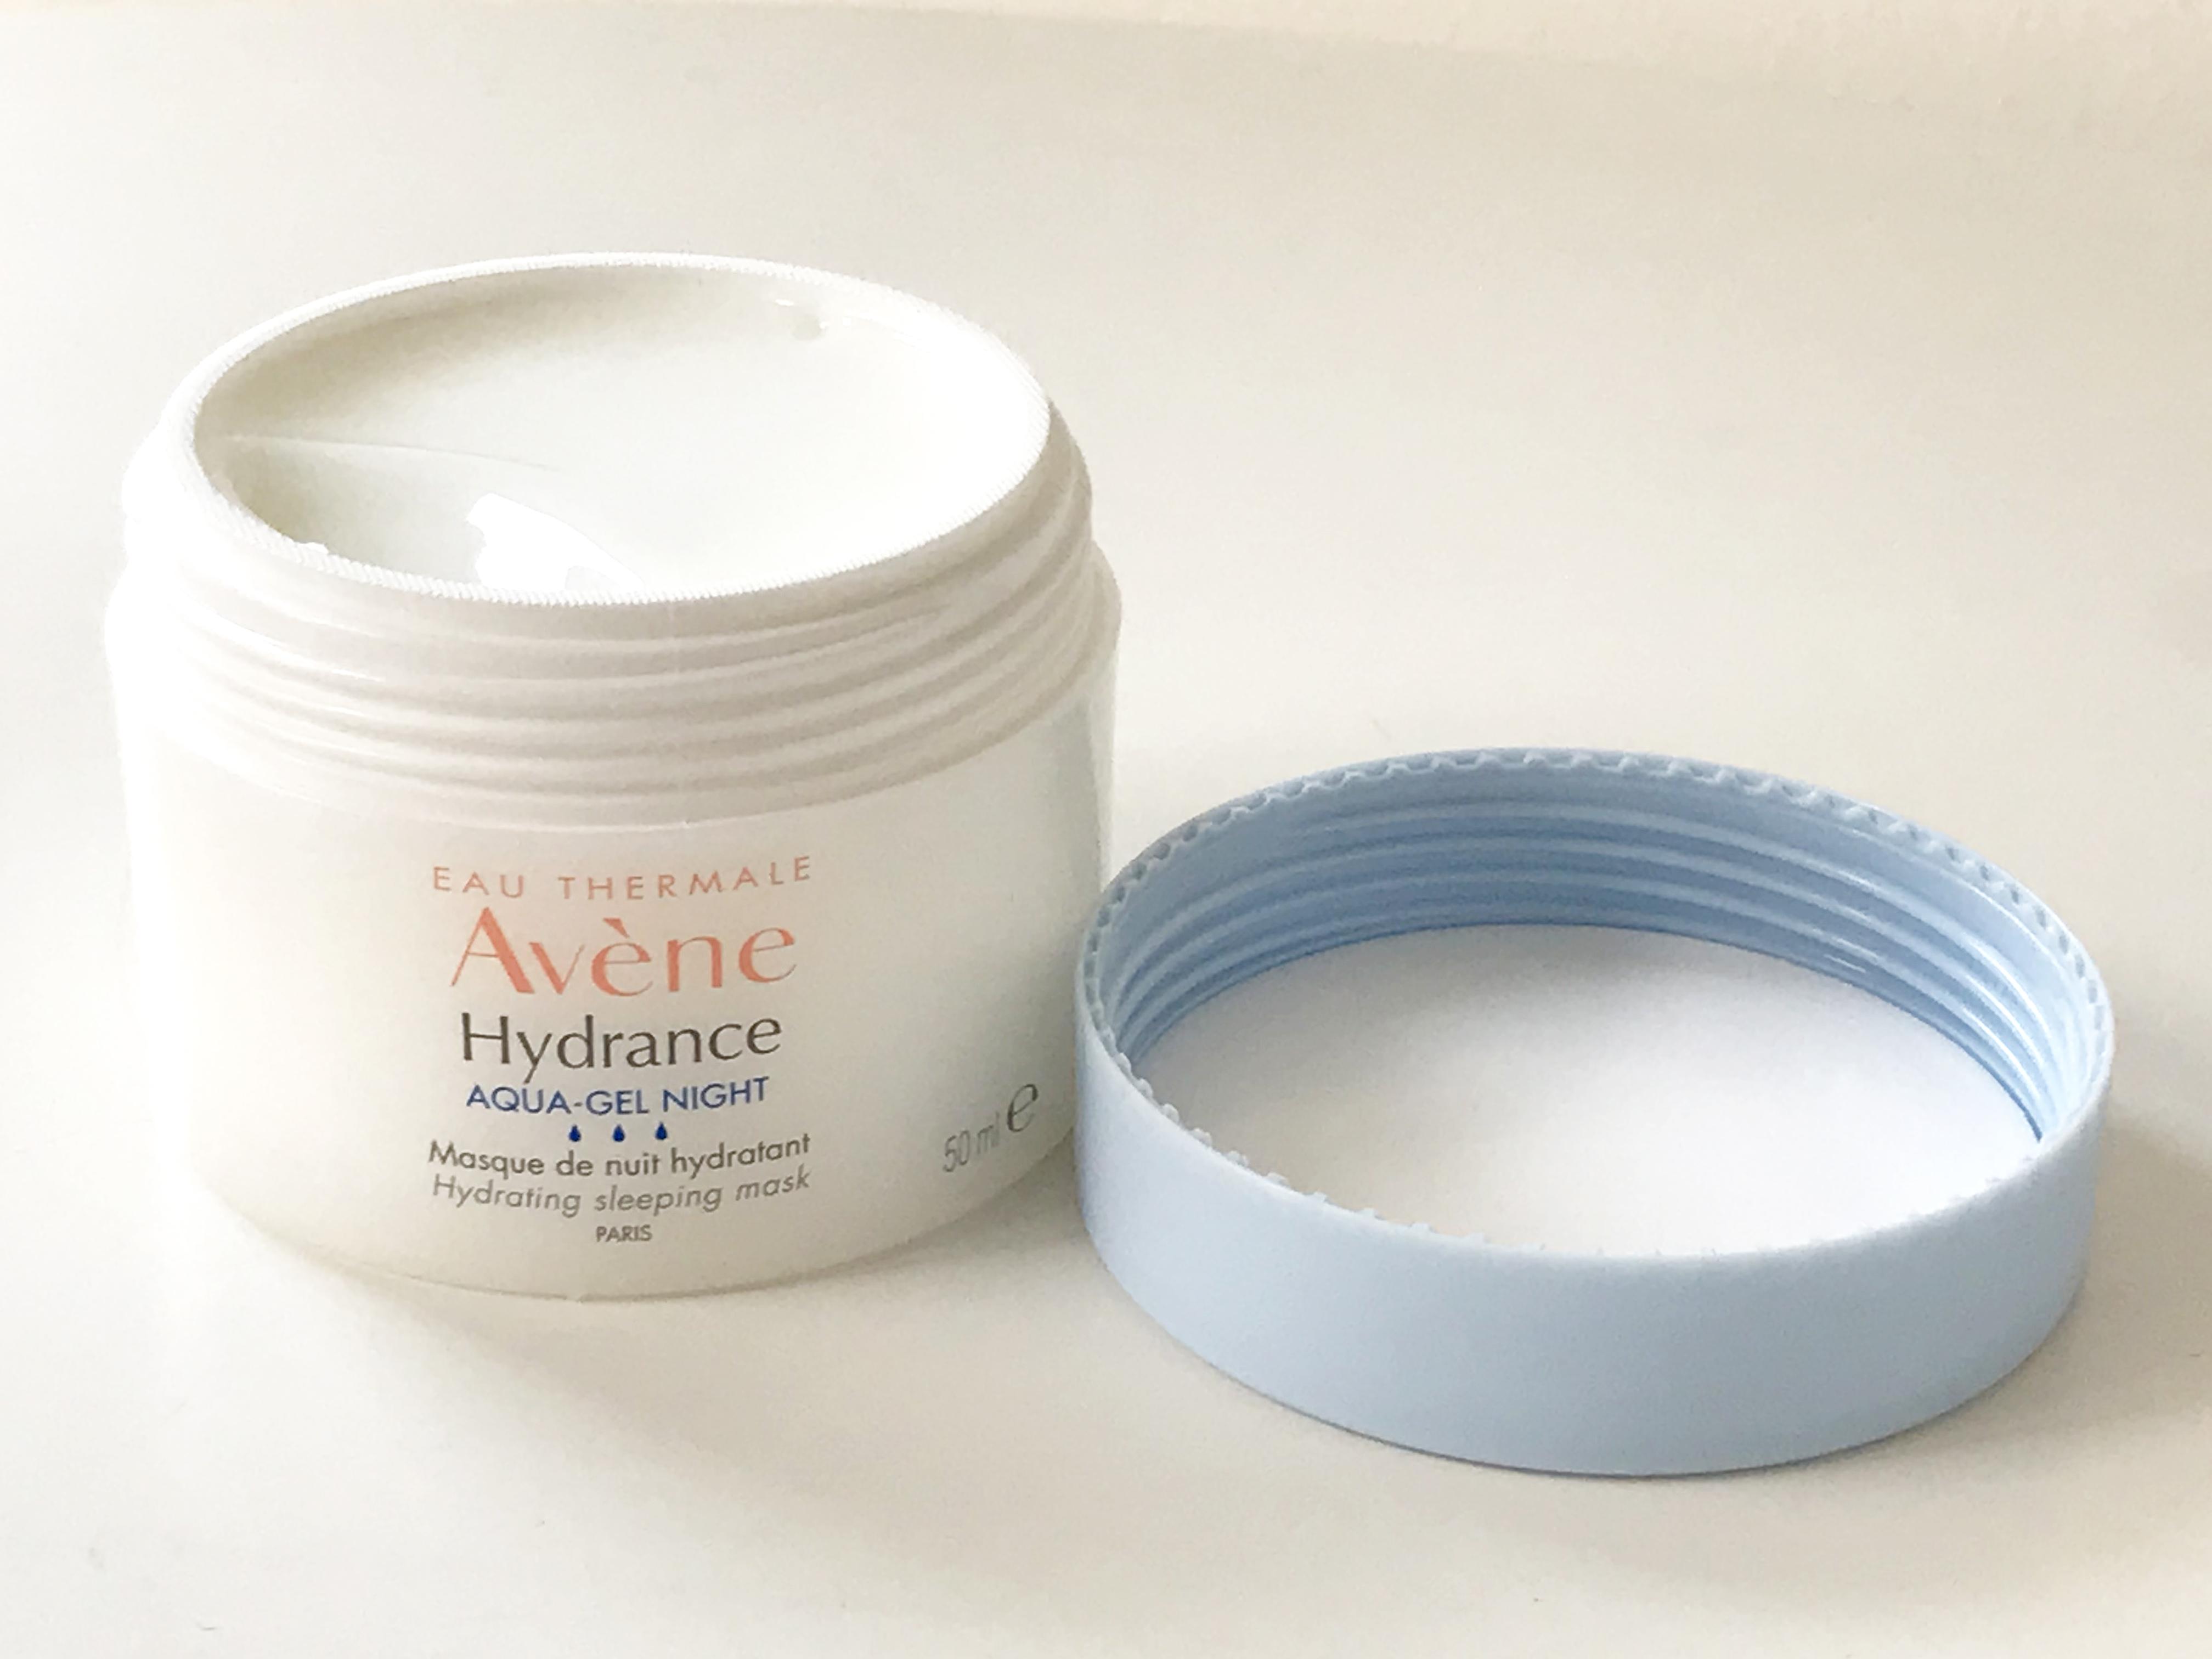 Avène Hydrance Aqua Gel Night Hydrating Sleeping Mask Review